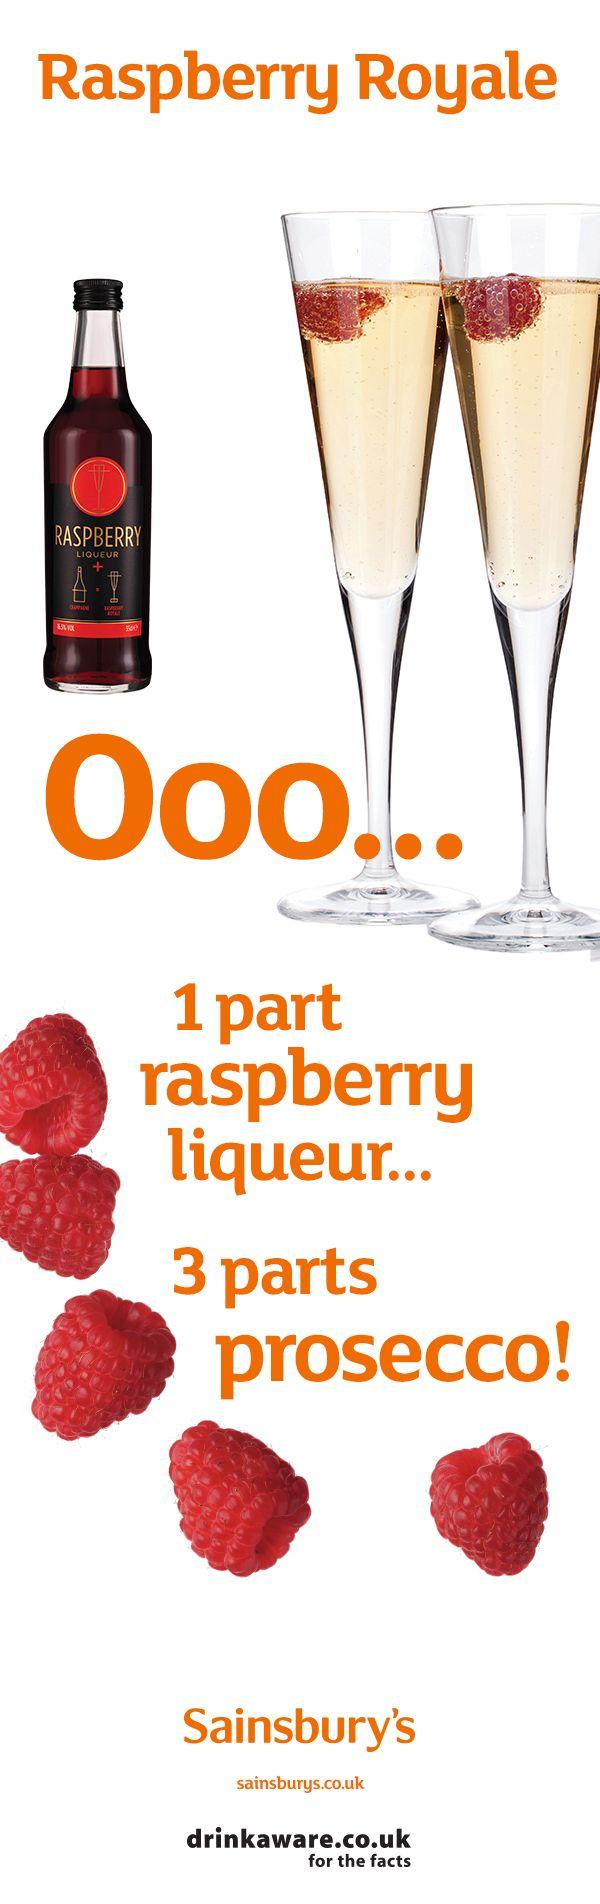 Sainburysrecipes Cocktails Raspberryliqueur Bitters Sainsburys Prosecco Homemade Drinks Food And Drink Yummy Drinks